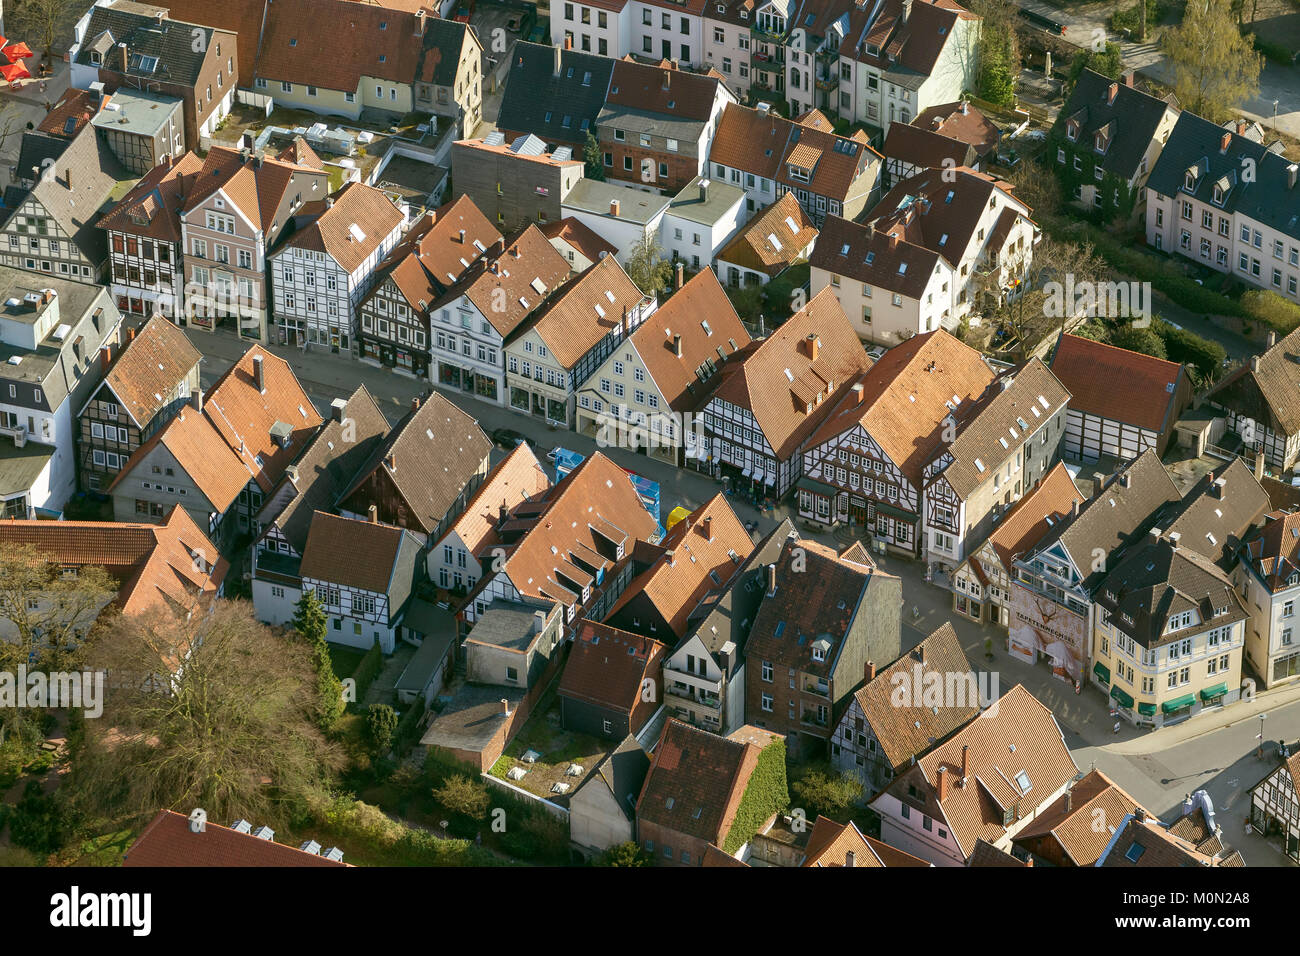 Krummestraße with half-timbered houses, aerial photograph of Detmold, Detmold, North Rhine-Westphalia, Germany, Europe, aerial view, birds-eyes view,  Stock Photo